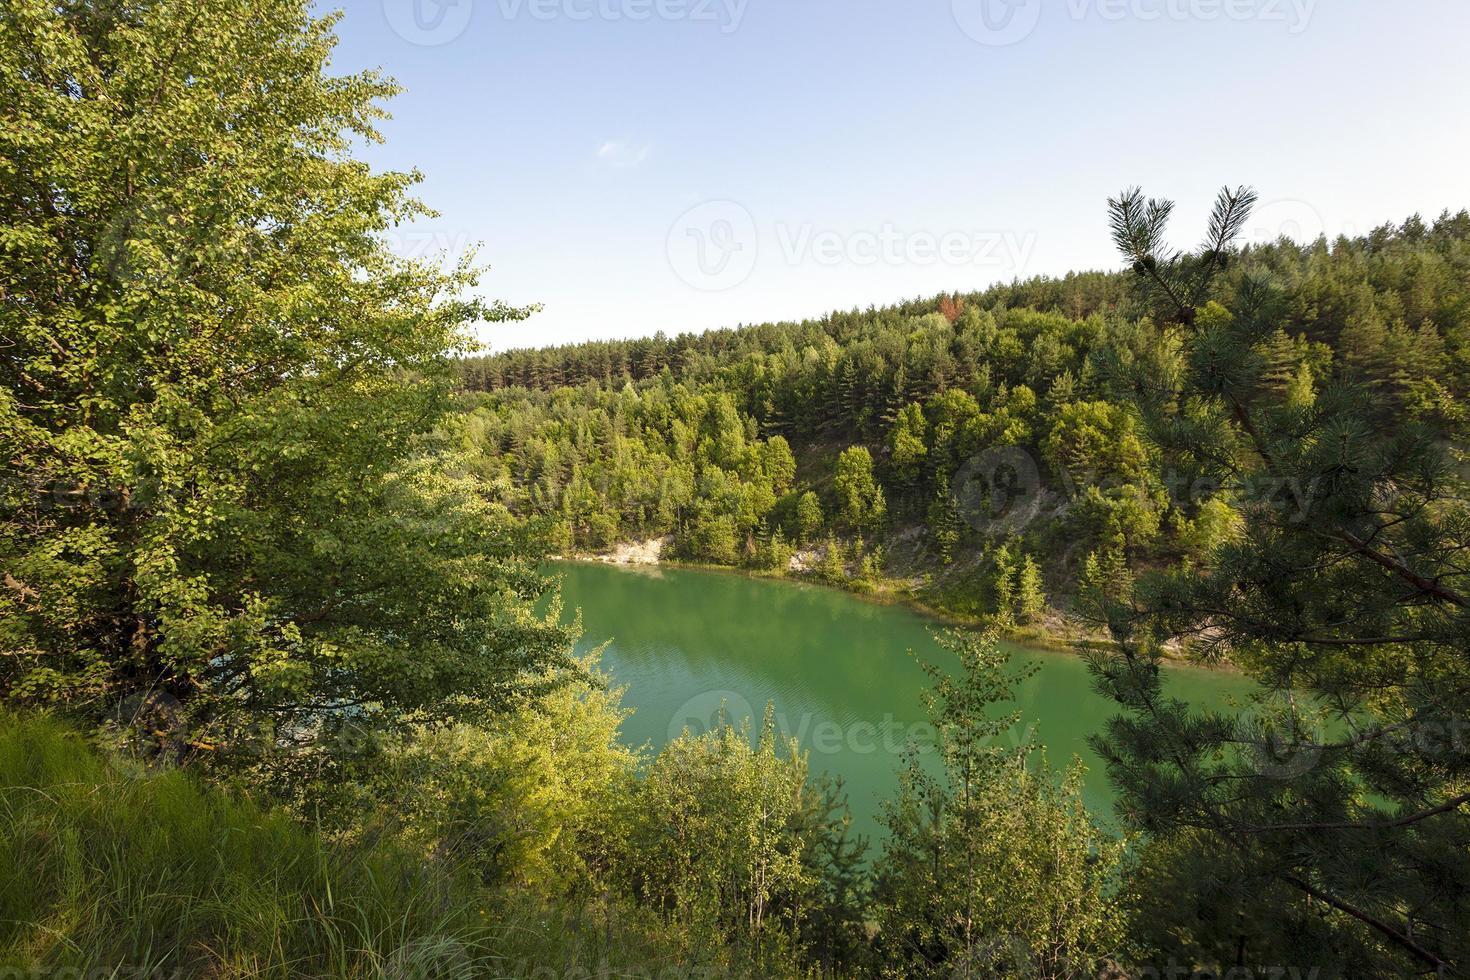 lago artificiale bielorussia foto